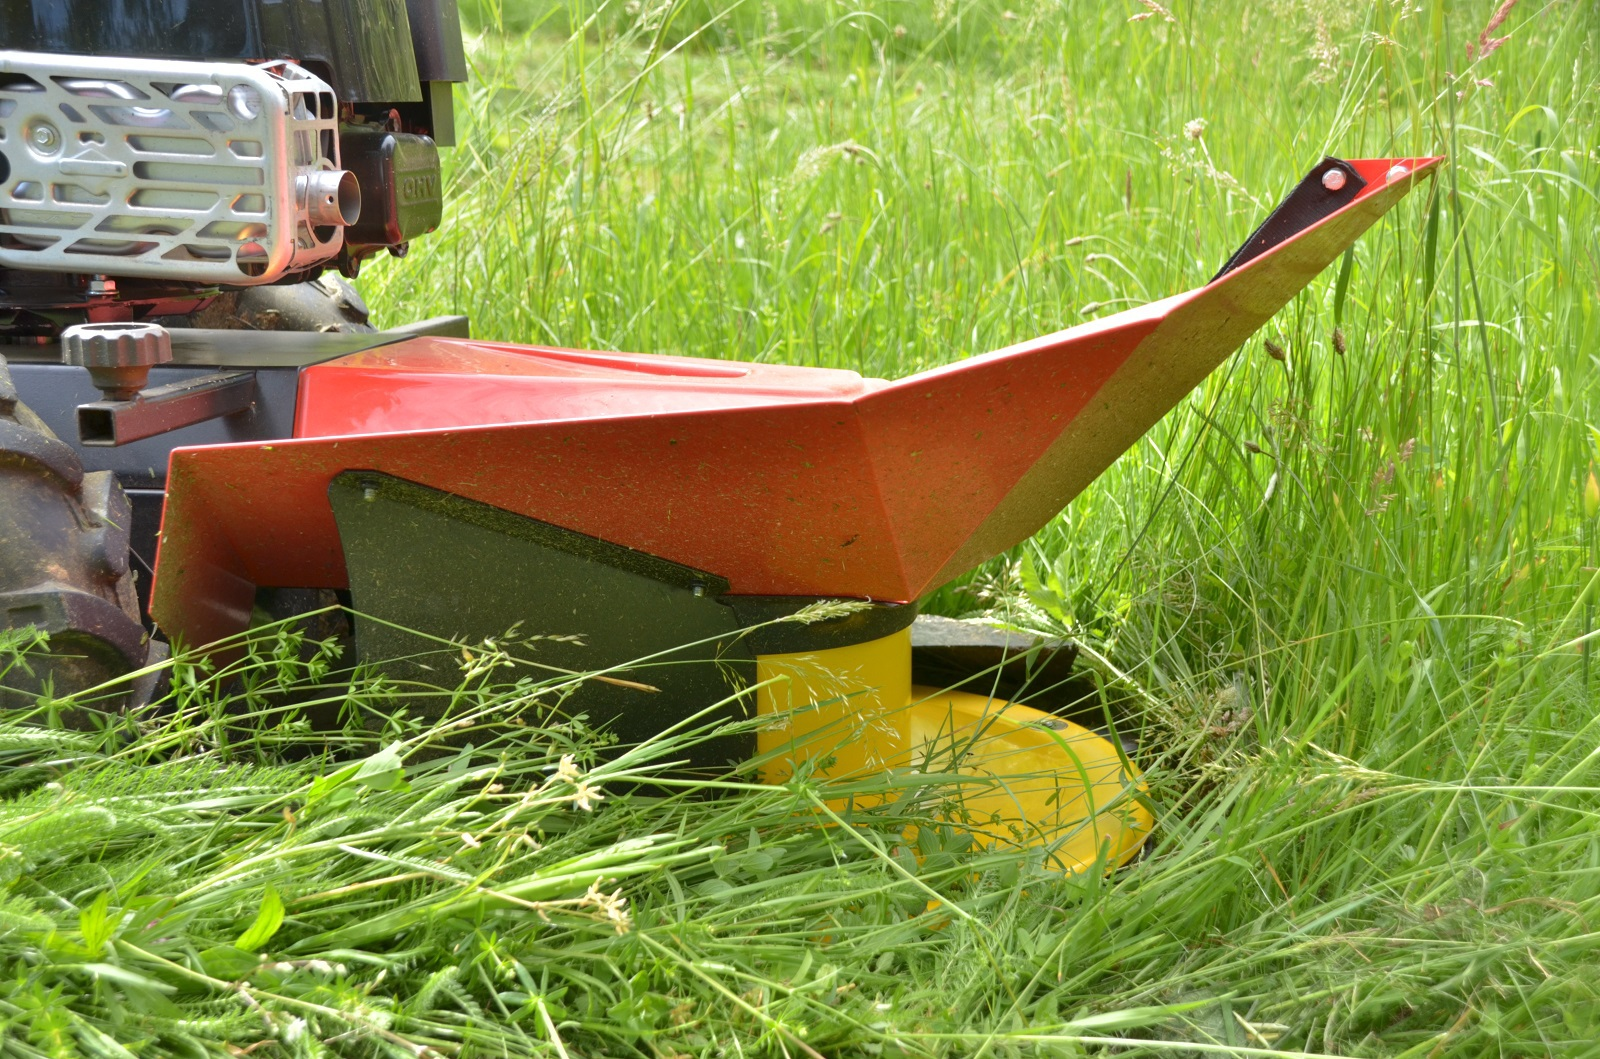 Gestrüppmäher / Kreiselmäher BDR-620DBiS Dorotha B&S 875 iS 62cm Bild 6